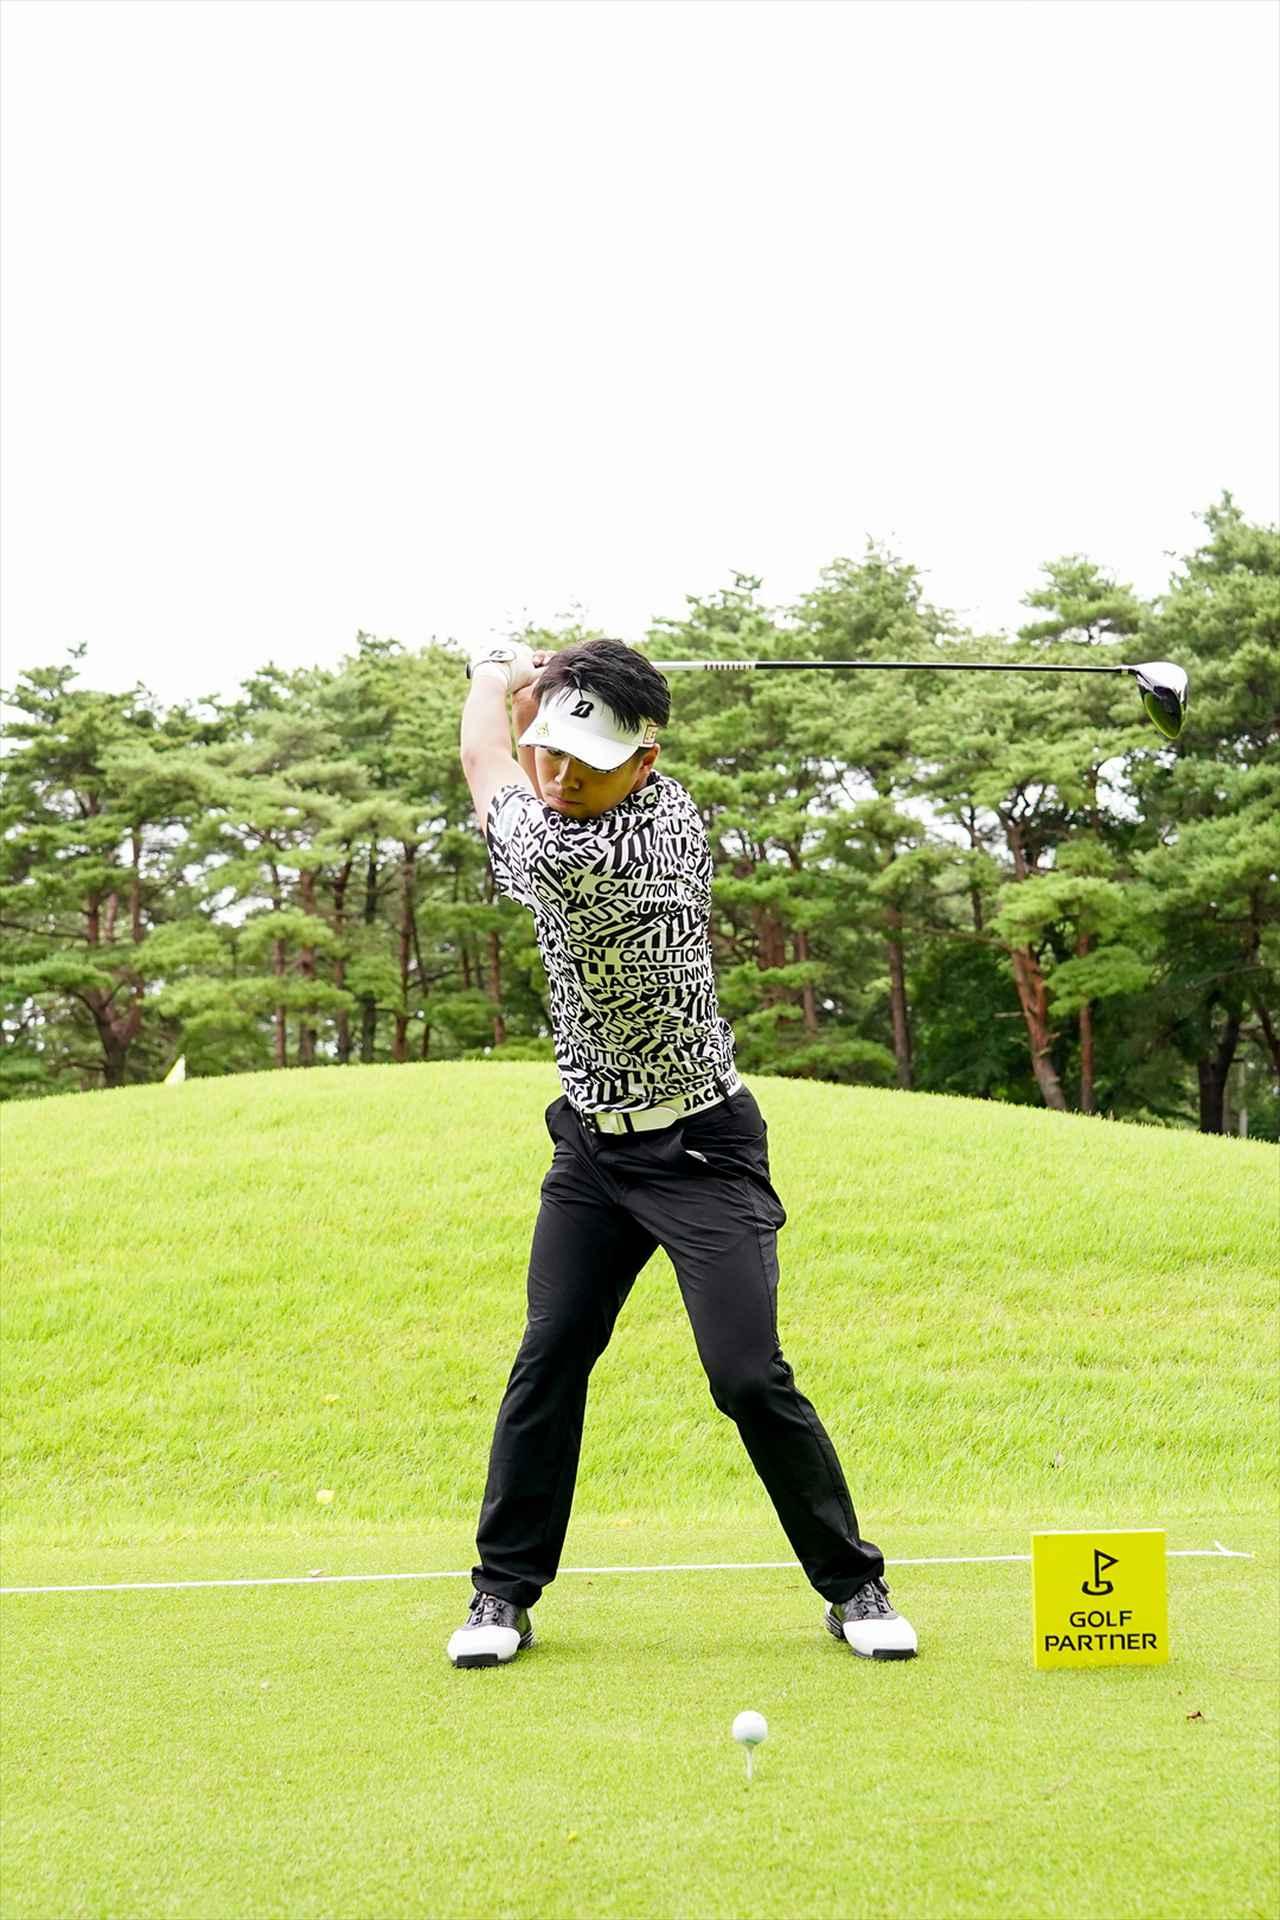 Images : 4番目の画像 - 関藤直煕 ドライバー正面連続写真 - みんなのゴルフダイジェスト